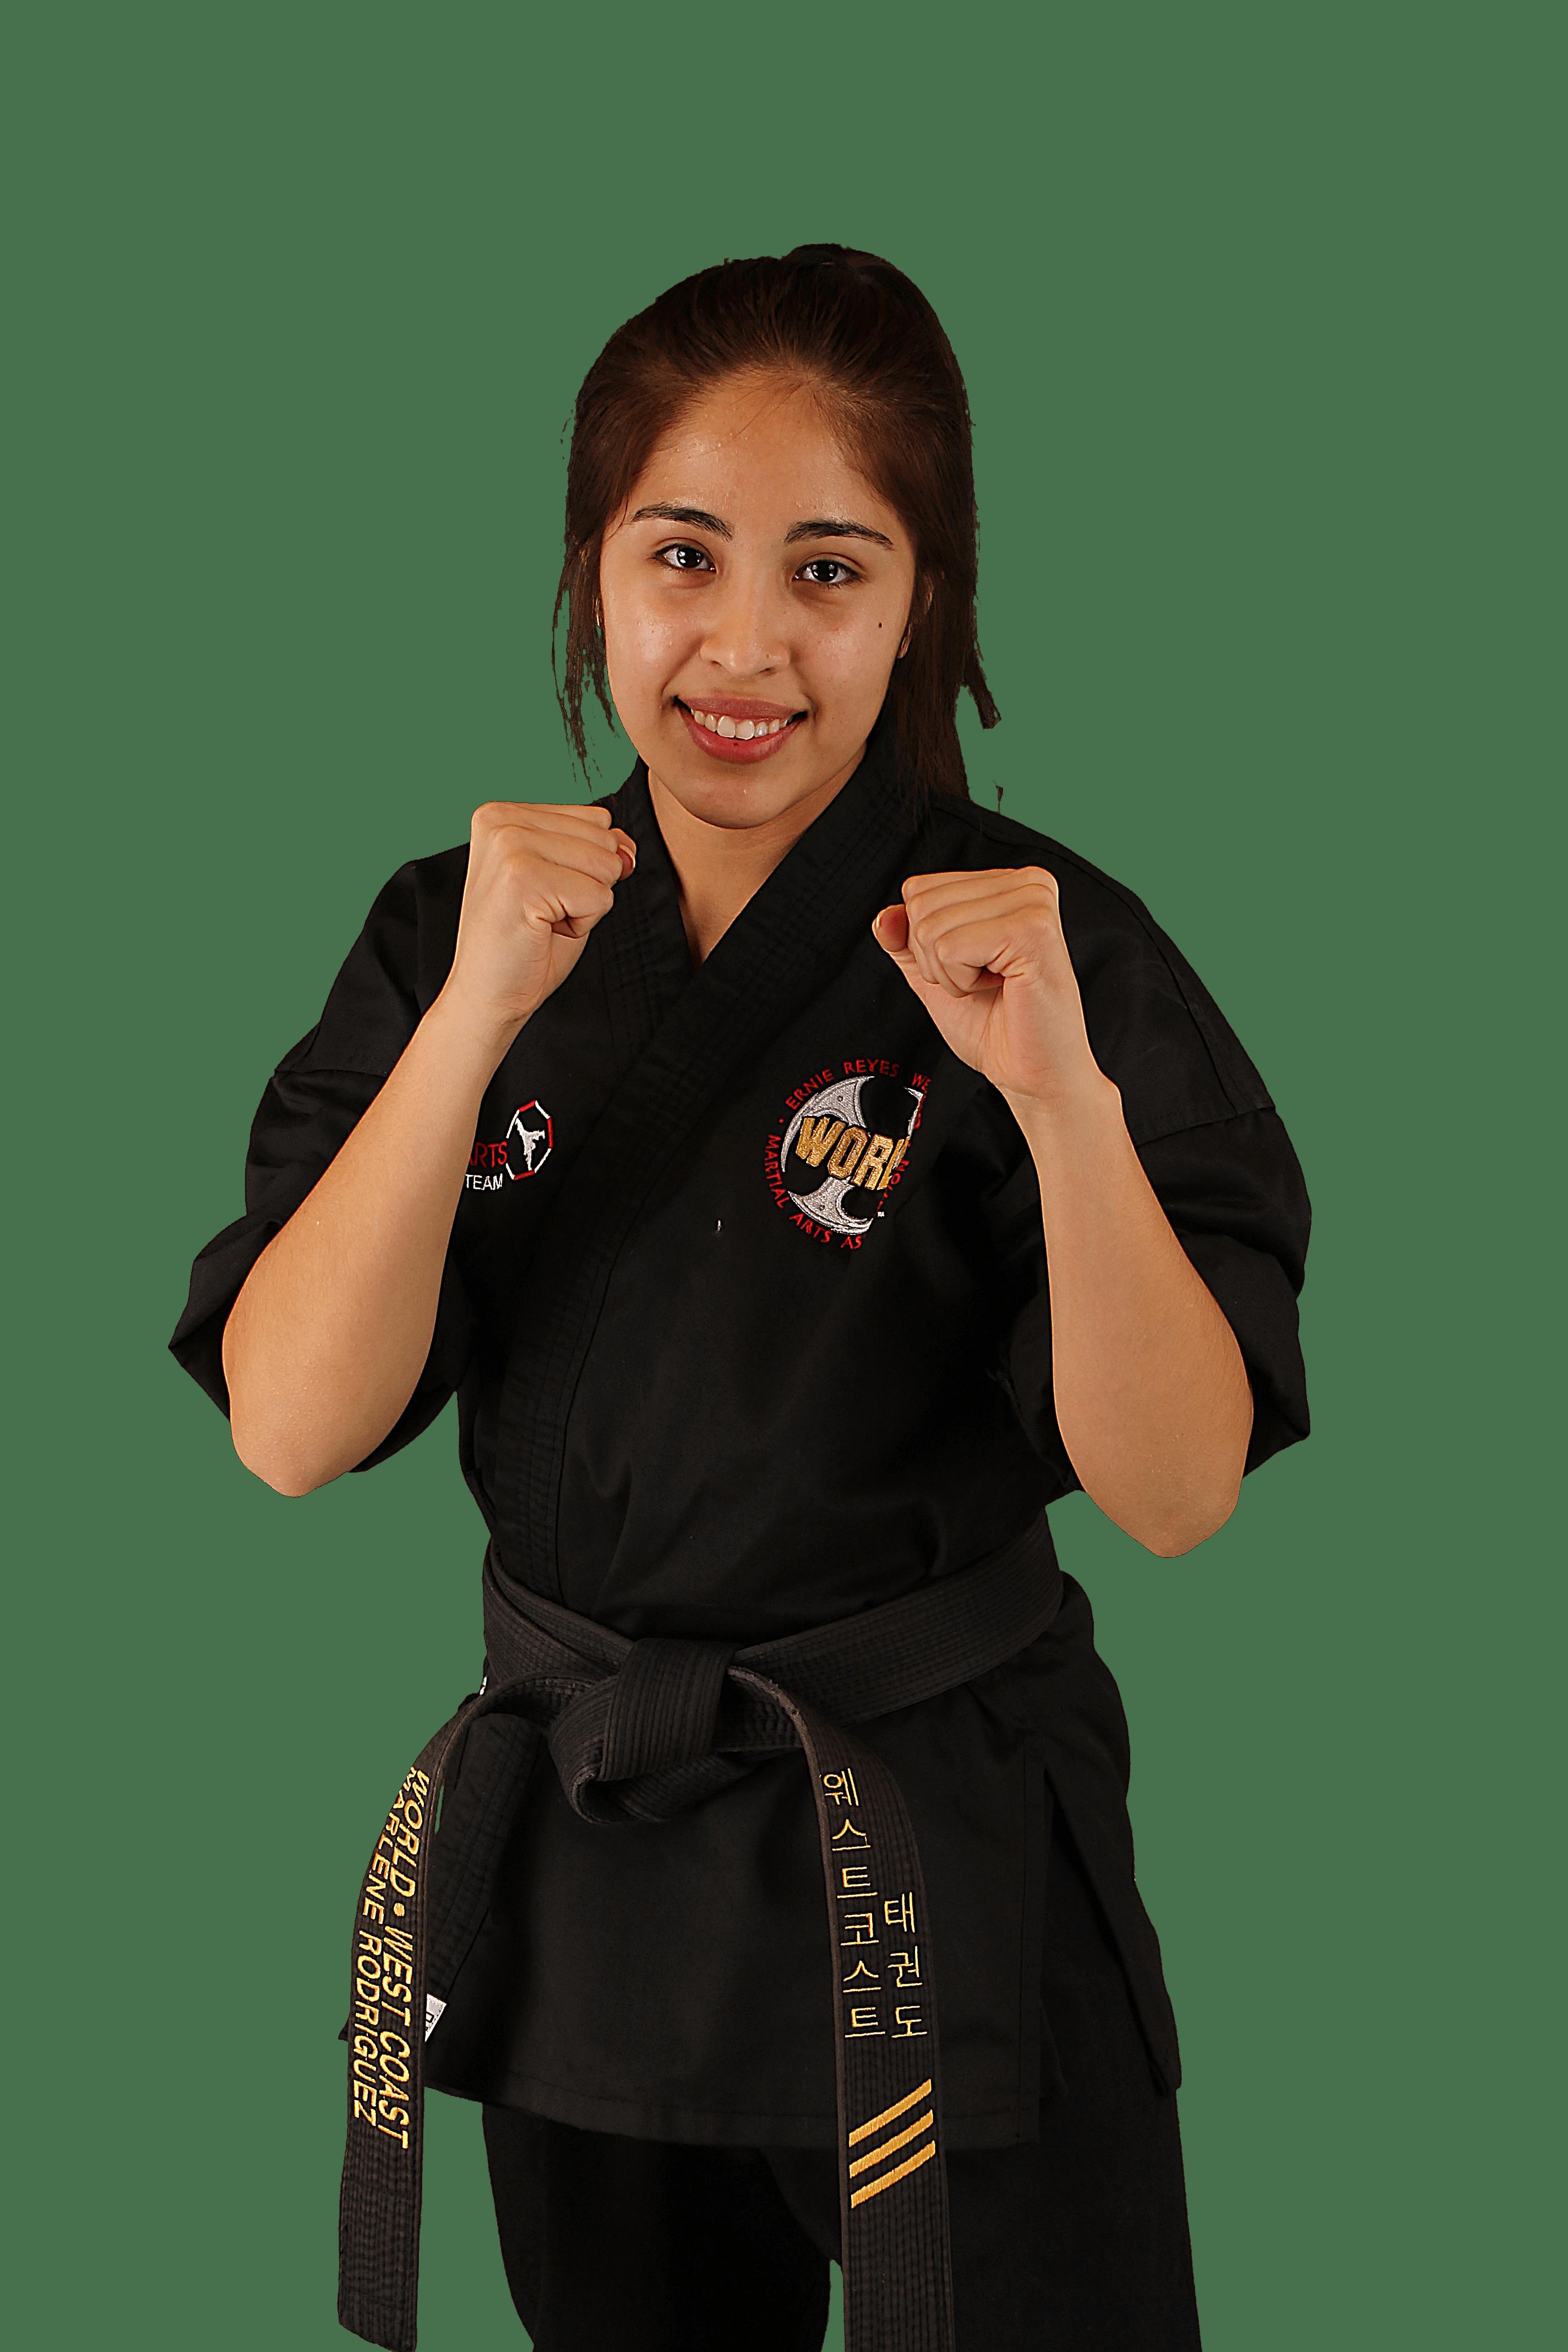 Marlene Rodriquez in Jonesboro - Joey Perry Martial Arts Academy